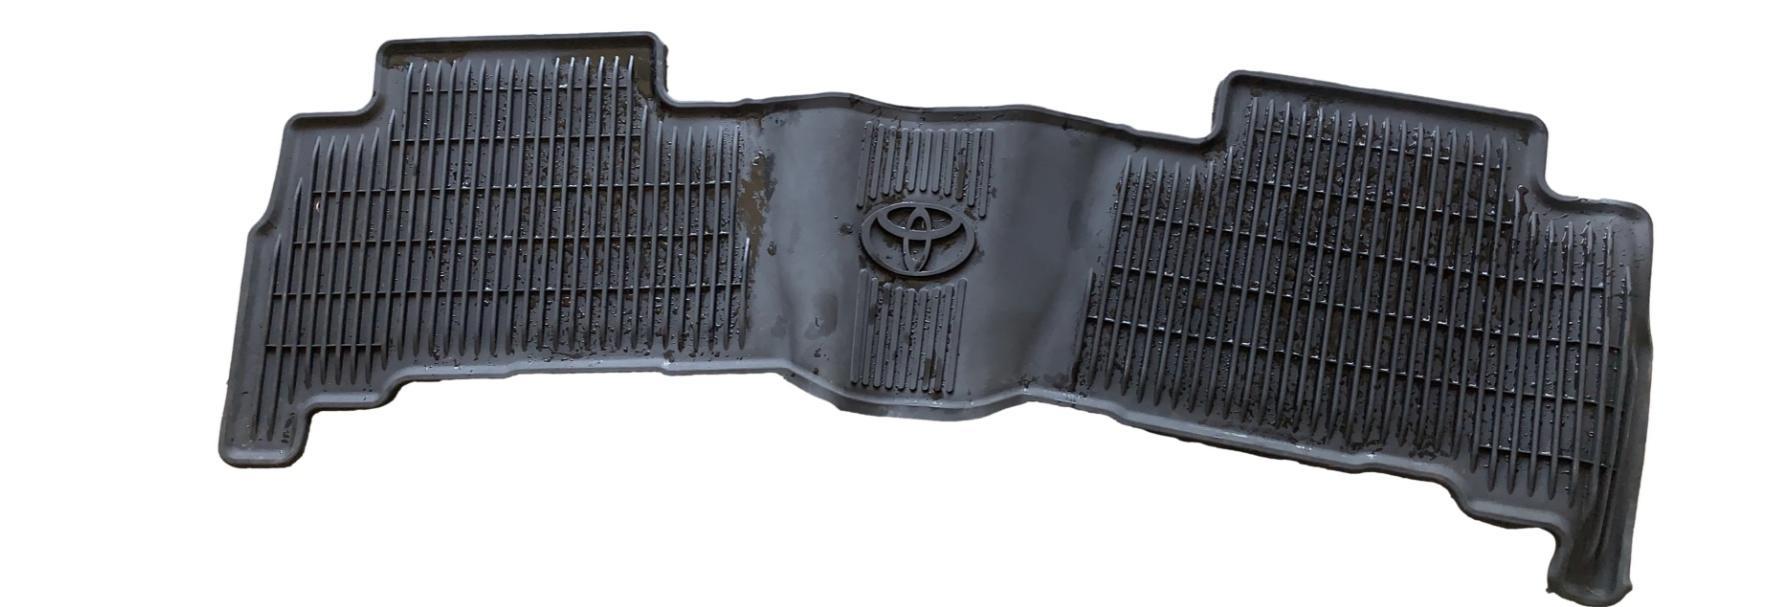 FS: 5th Gen TRD ORP Floor + Cargo Mats (New) - Bakersfield, California-f780772b-9637-4216-bd68-99d2c748e370-jpg